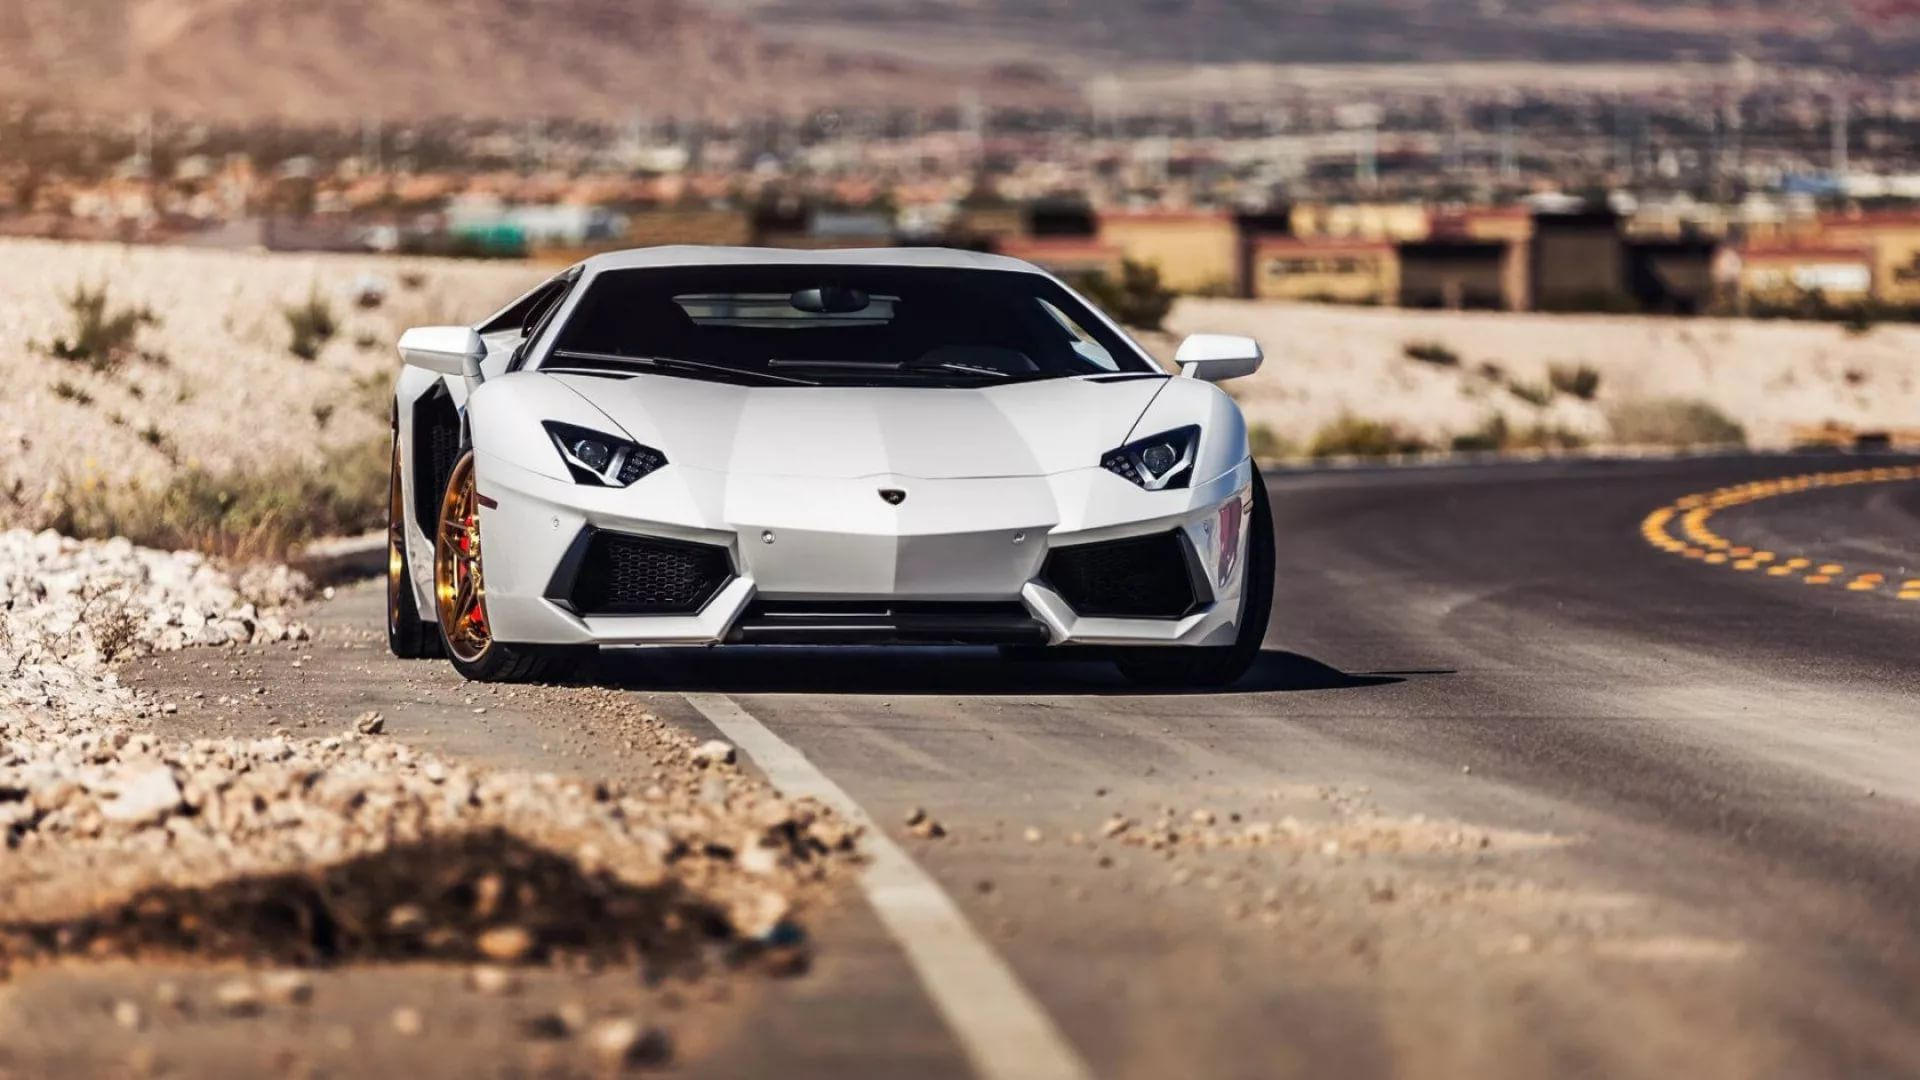 Lamborghini wallpaper and themes